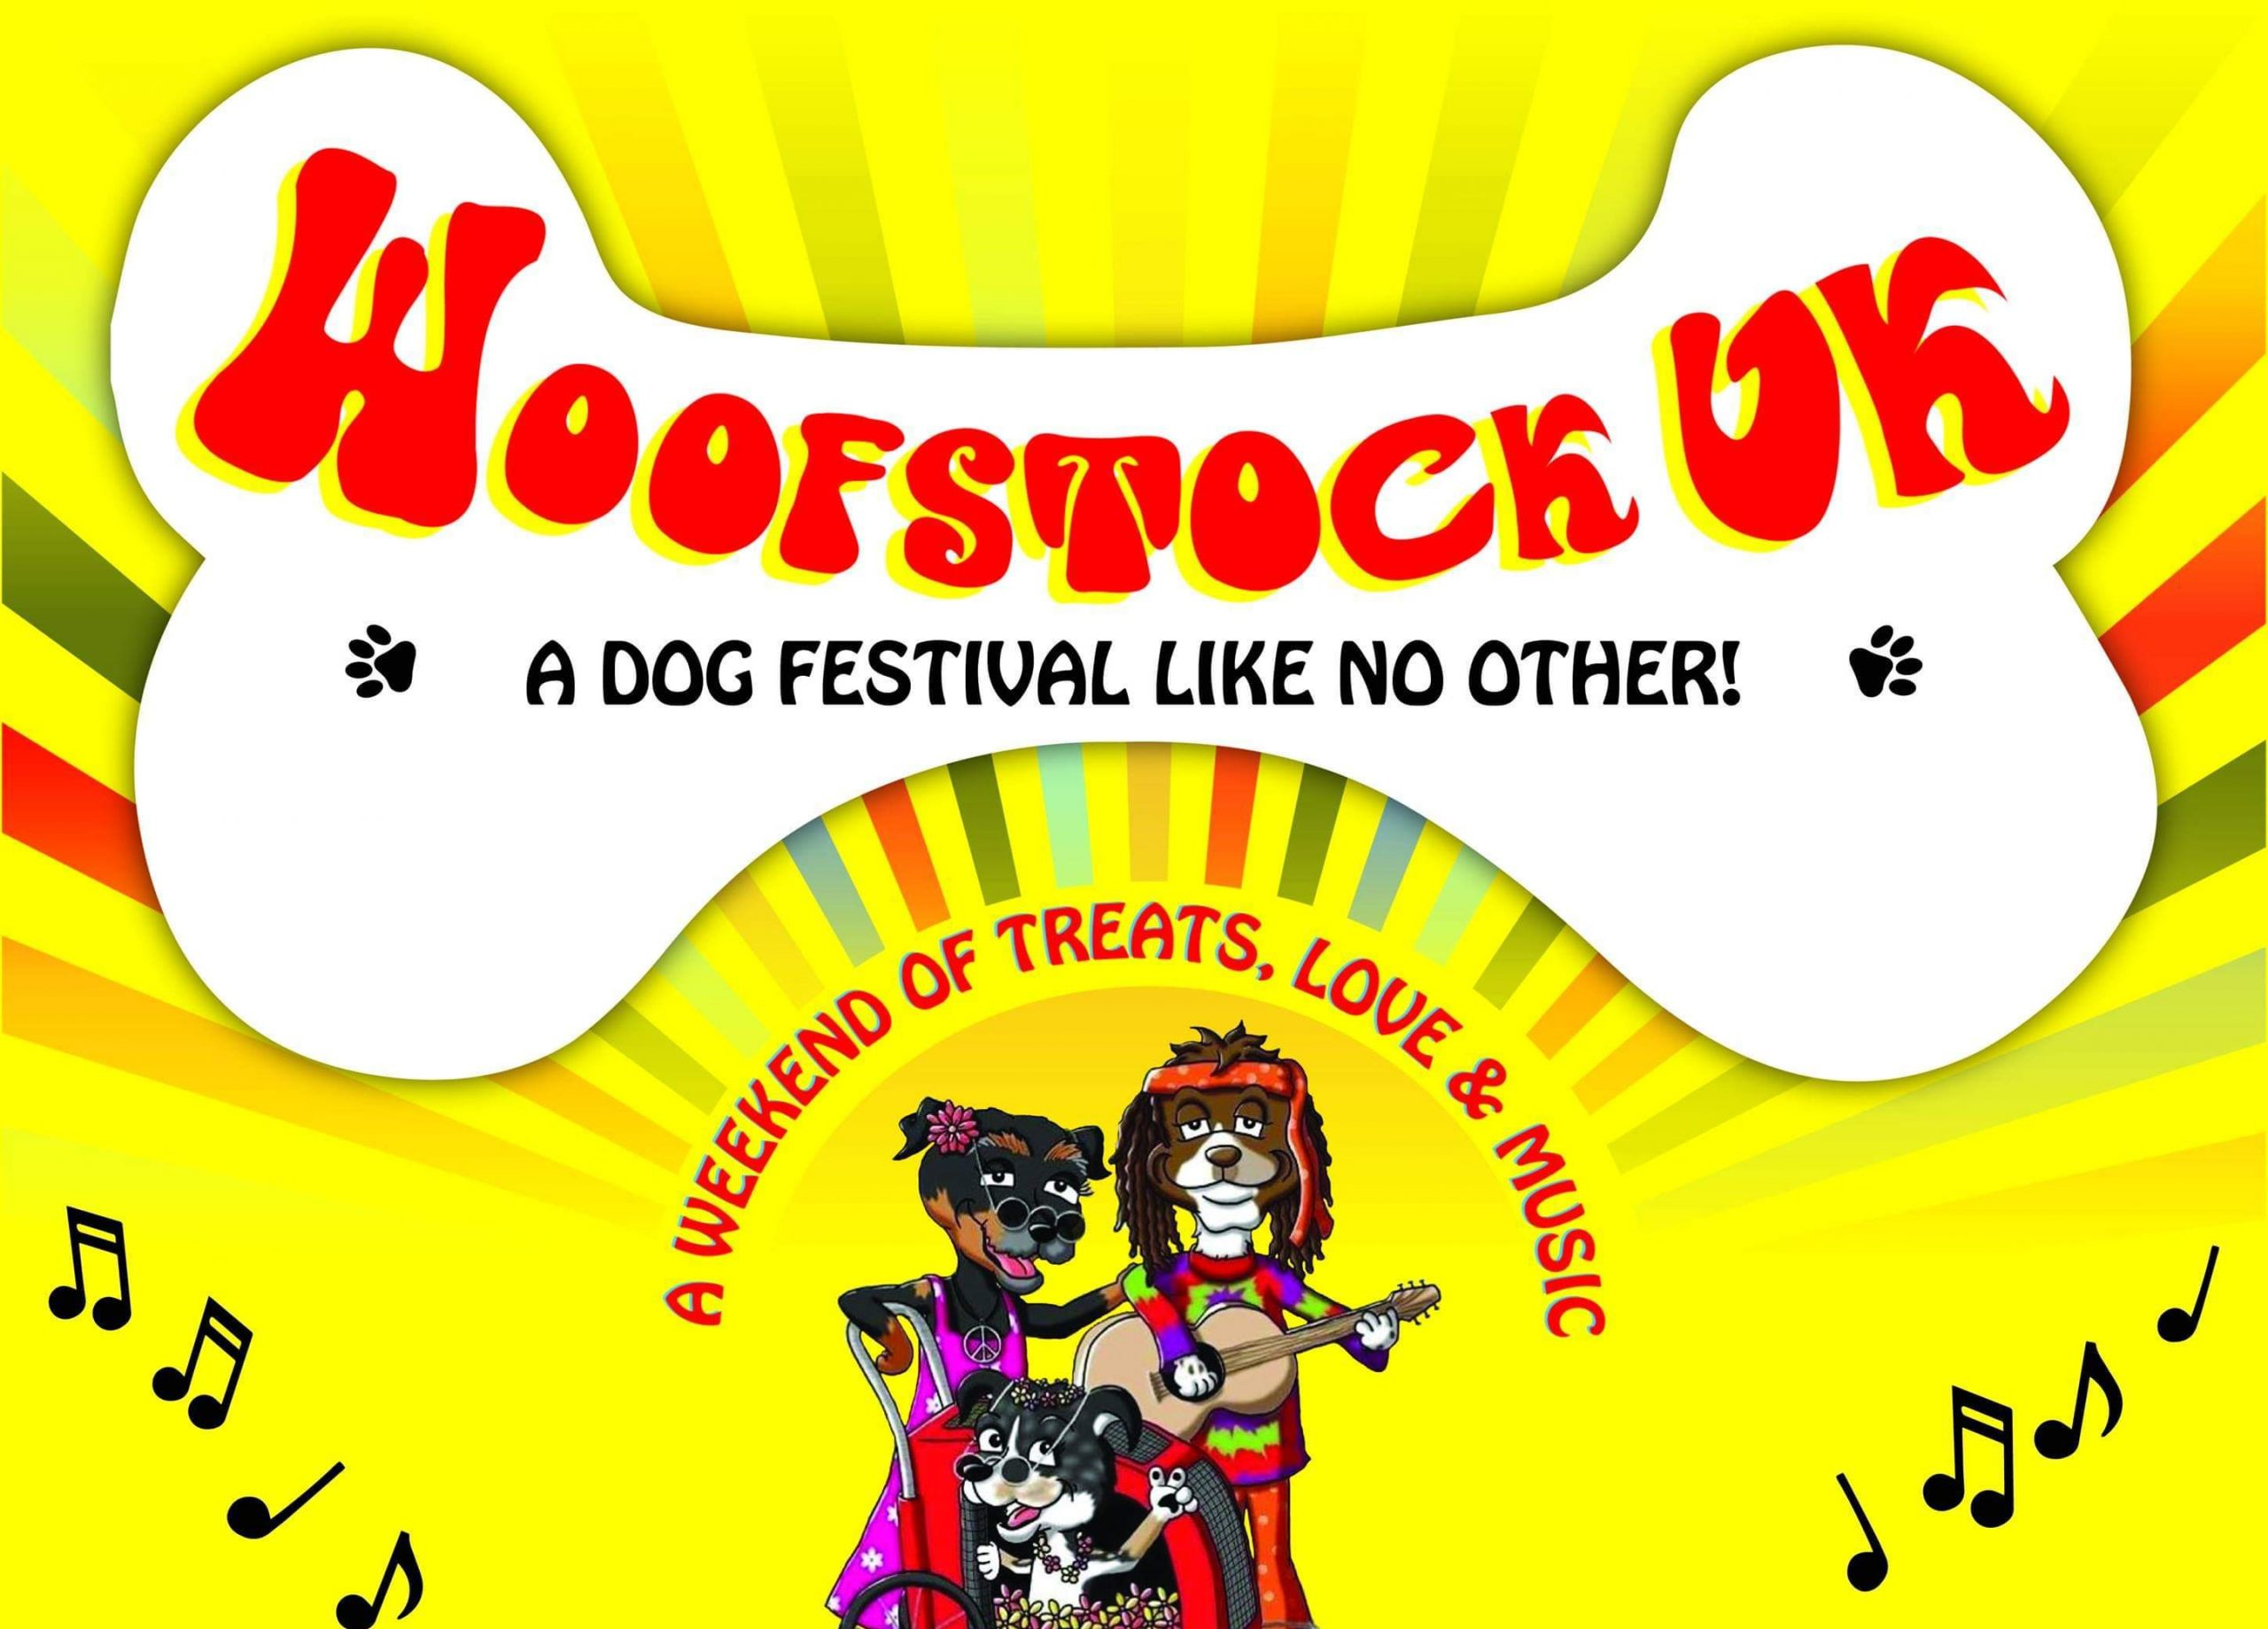 Woofstock UK